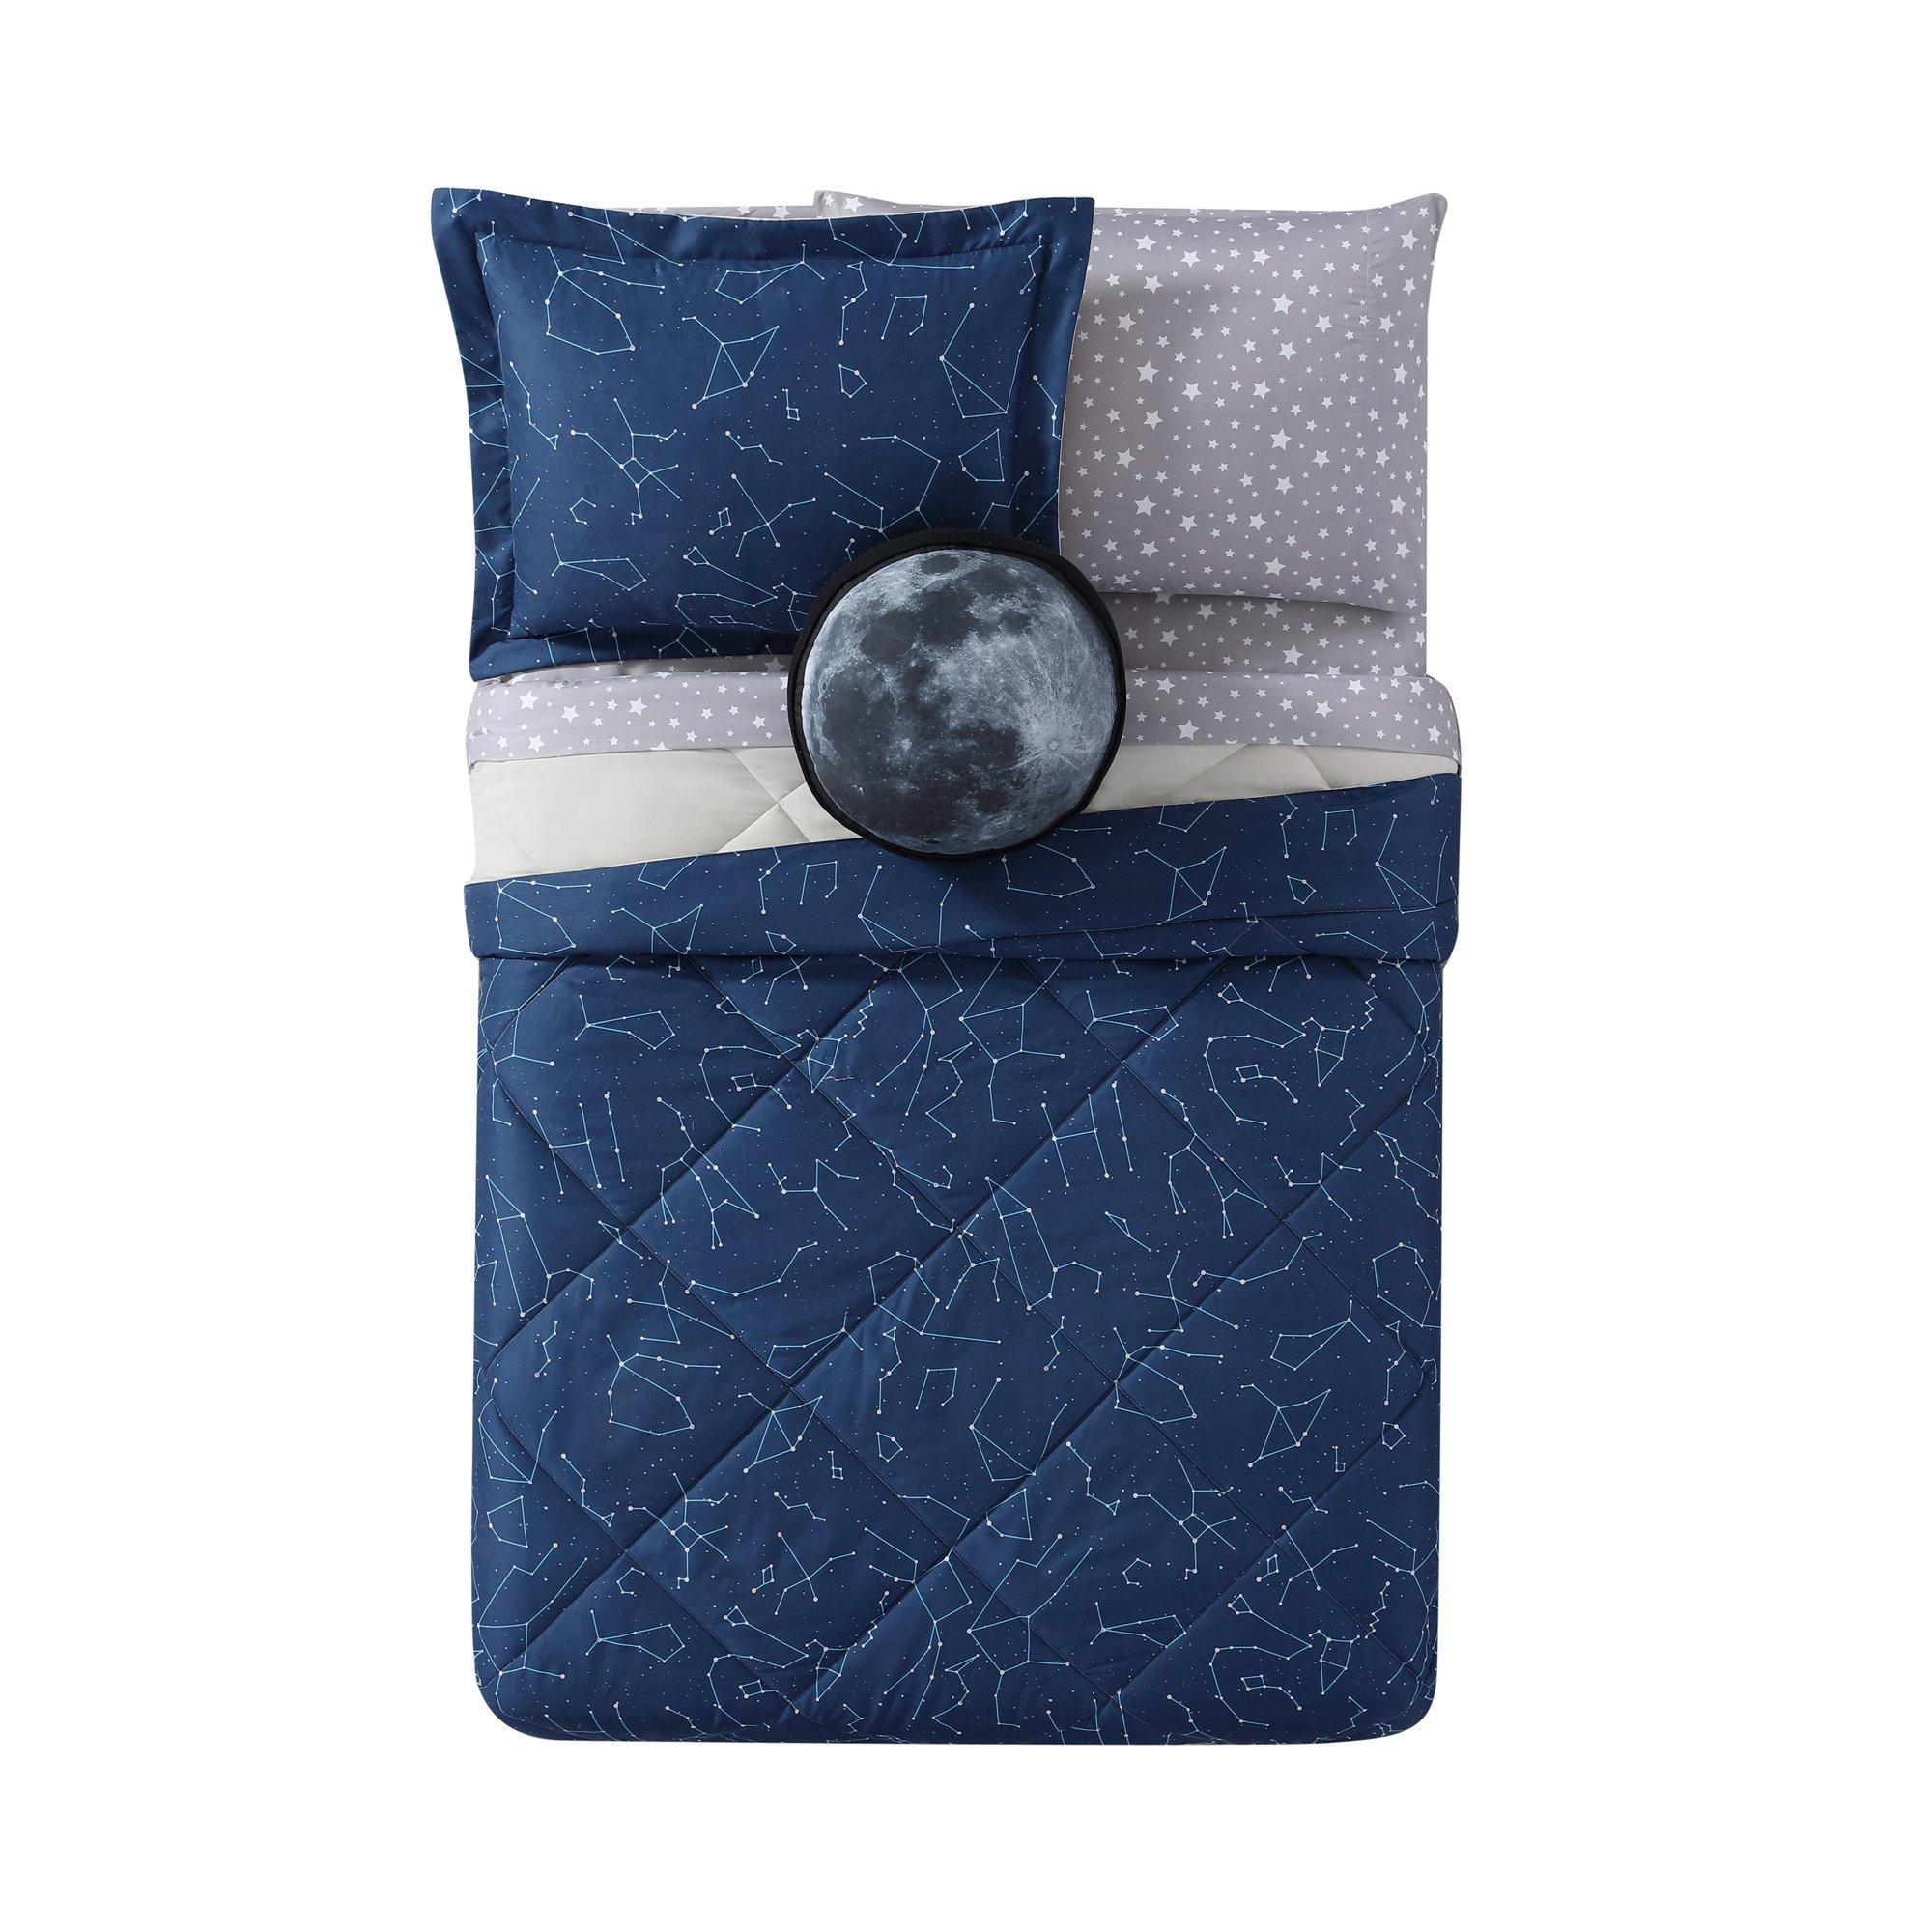 Laura Hart Kids Night Sky Printed 2-Piece Comforter Set, Twin X-Large, Midnight Blue Night Sky